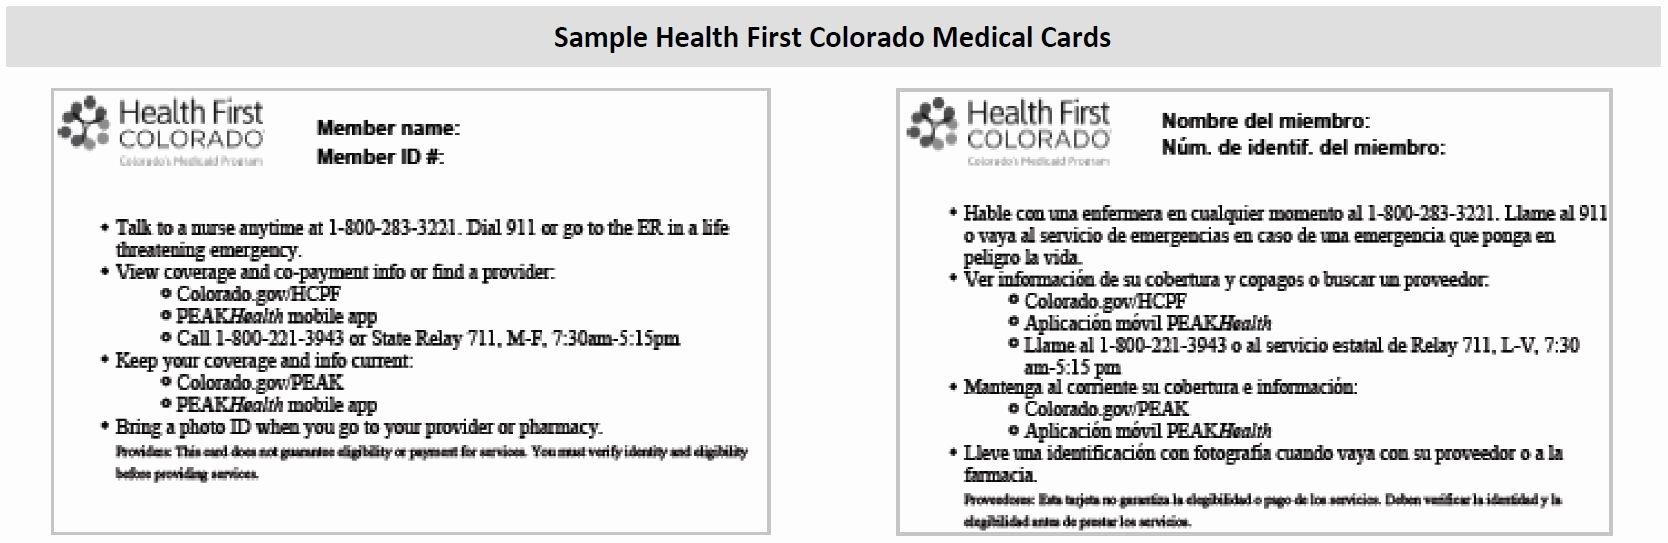 Sample Car Insurance Card Best Of How Do I Print A Health First Colorado Medical Card